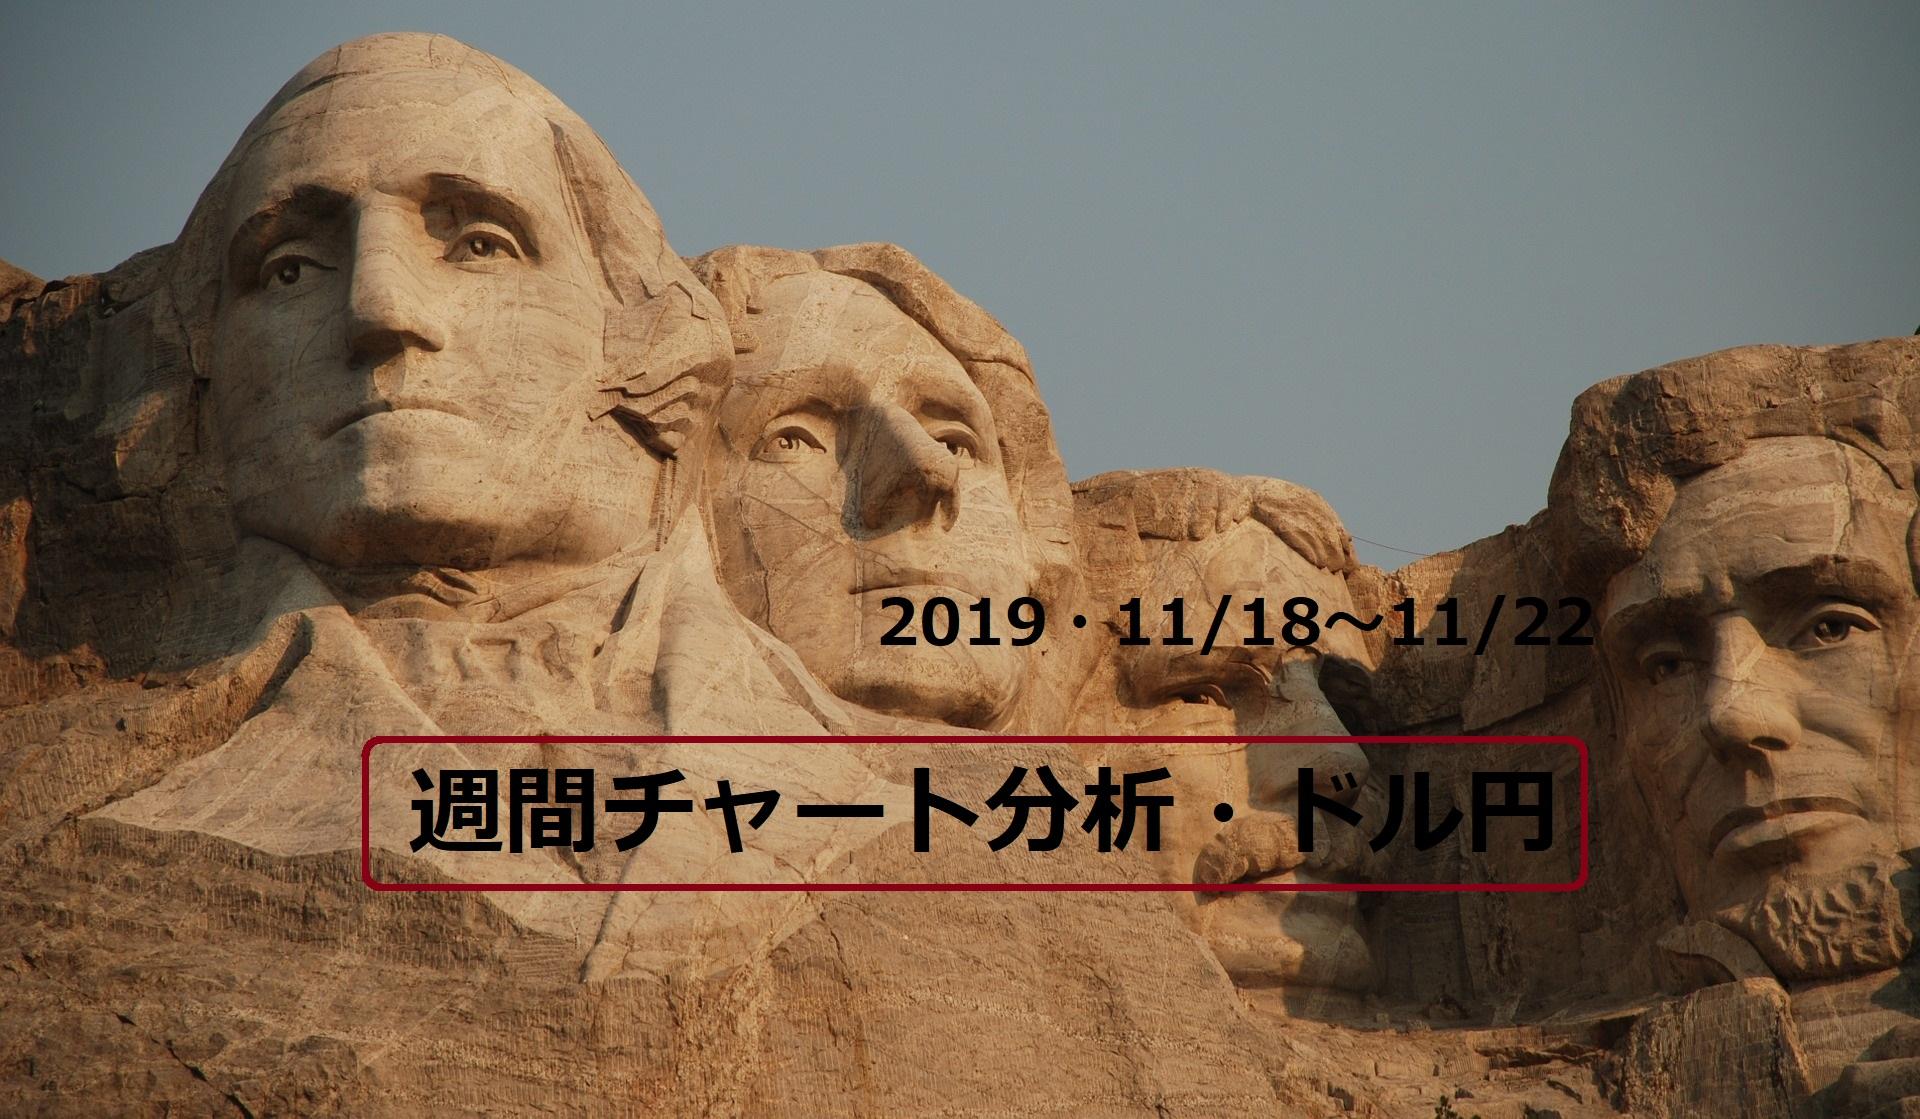 【FX】週間チャート分析・ドル円【2019・11/18~11/22】